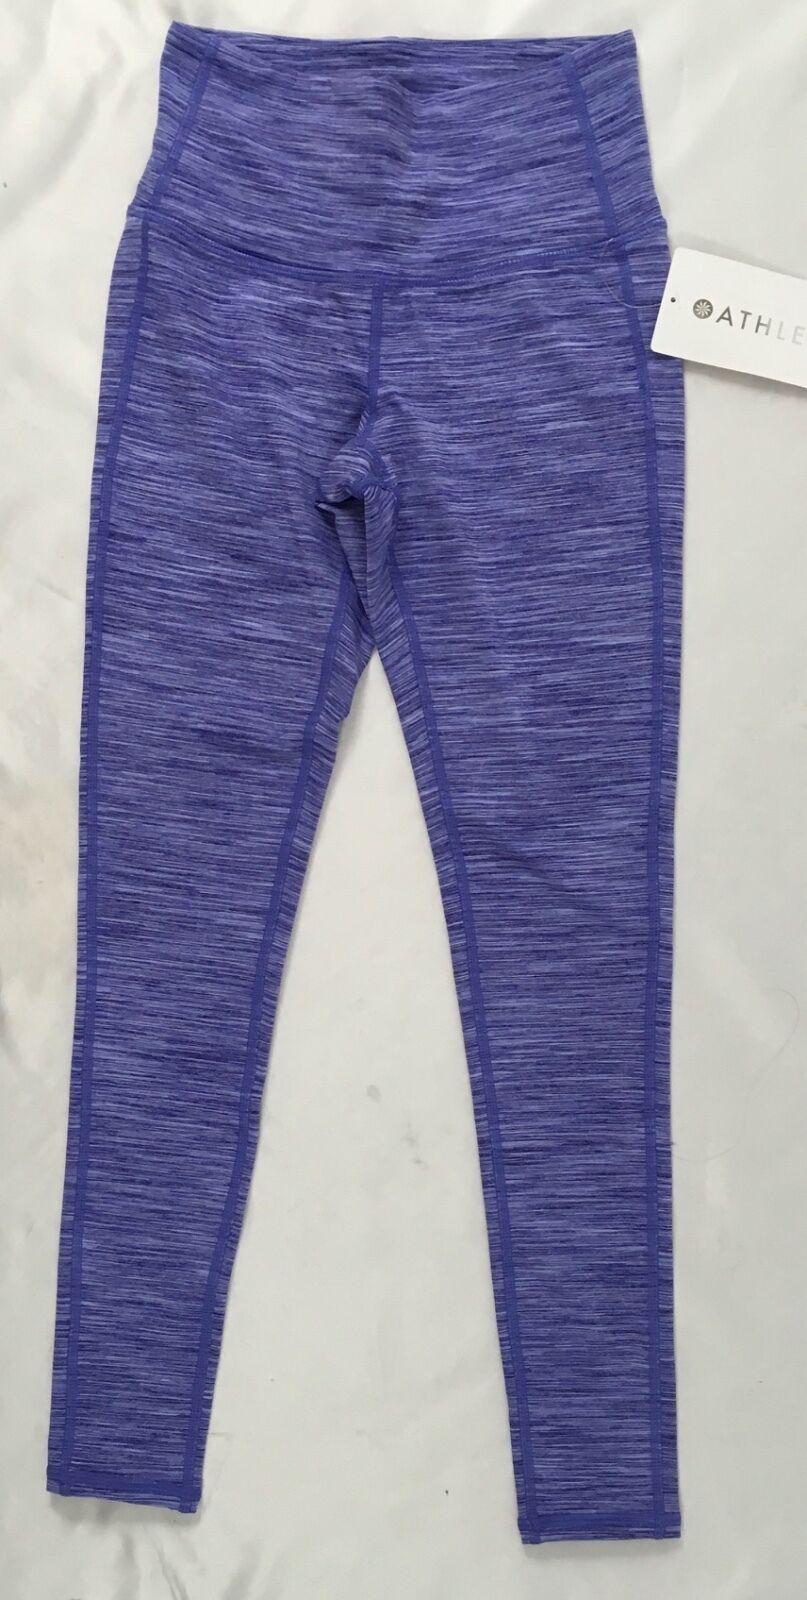 Athleta Women High Rise Serene Chaturanga 7 8 Tight Purple Luxe Quest Size 2XS